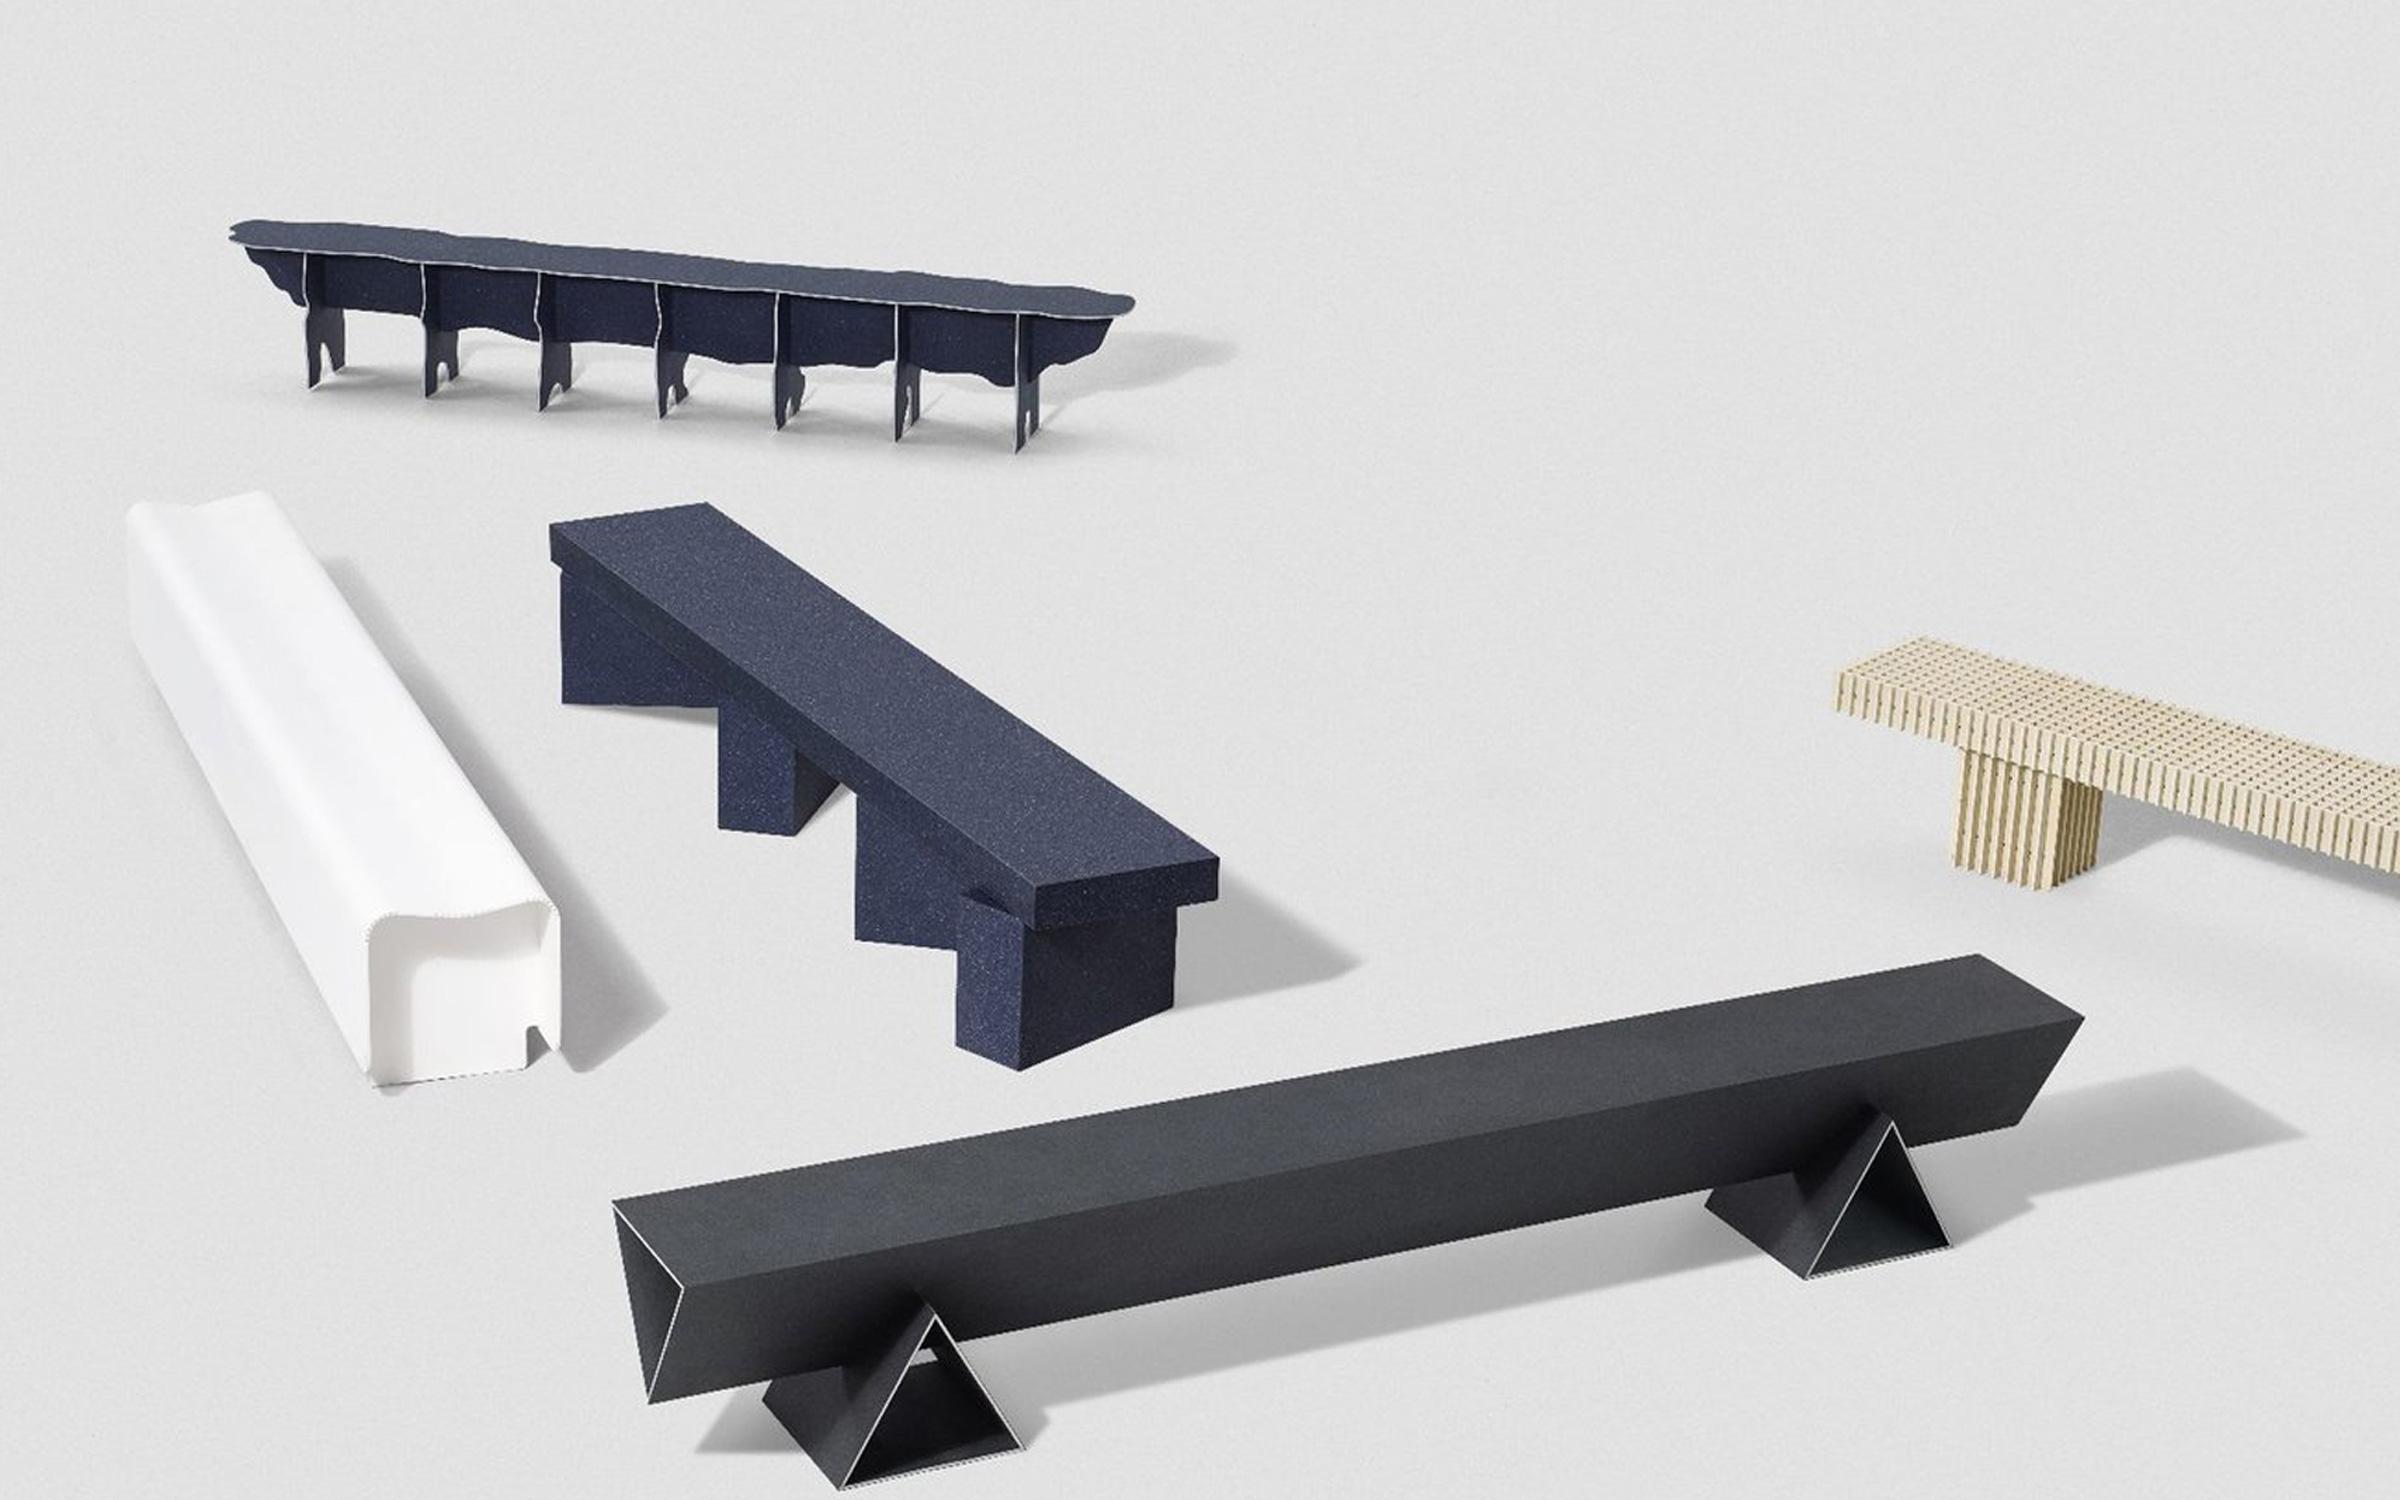 Materials Shape The Design Innovations 18 Dia Dittel Architekten